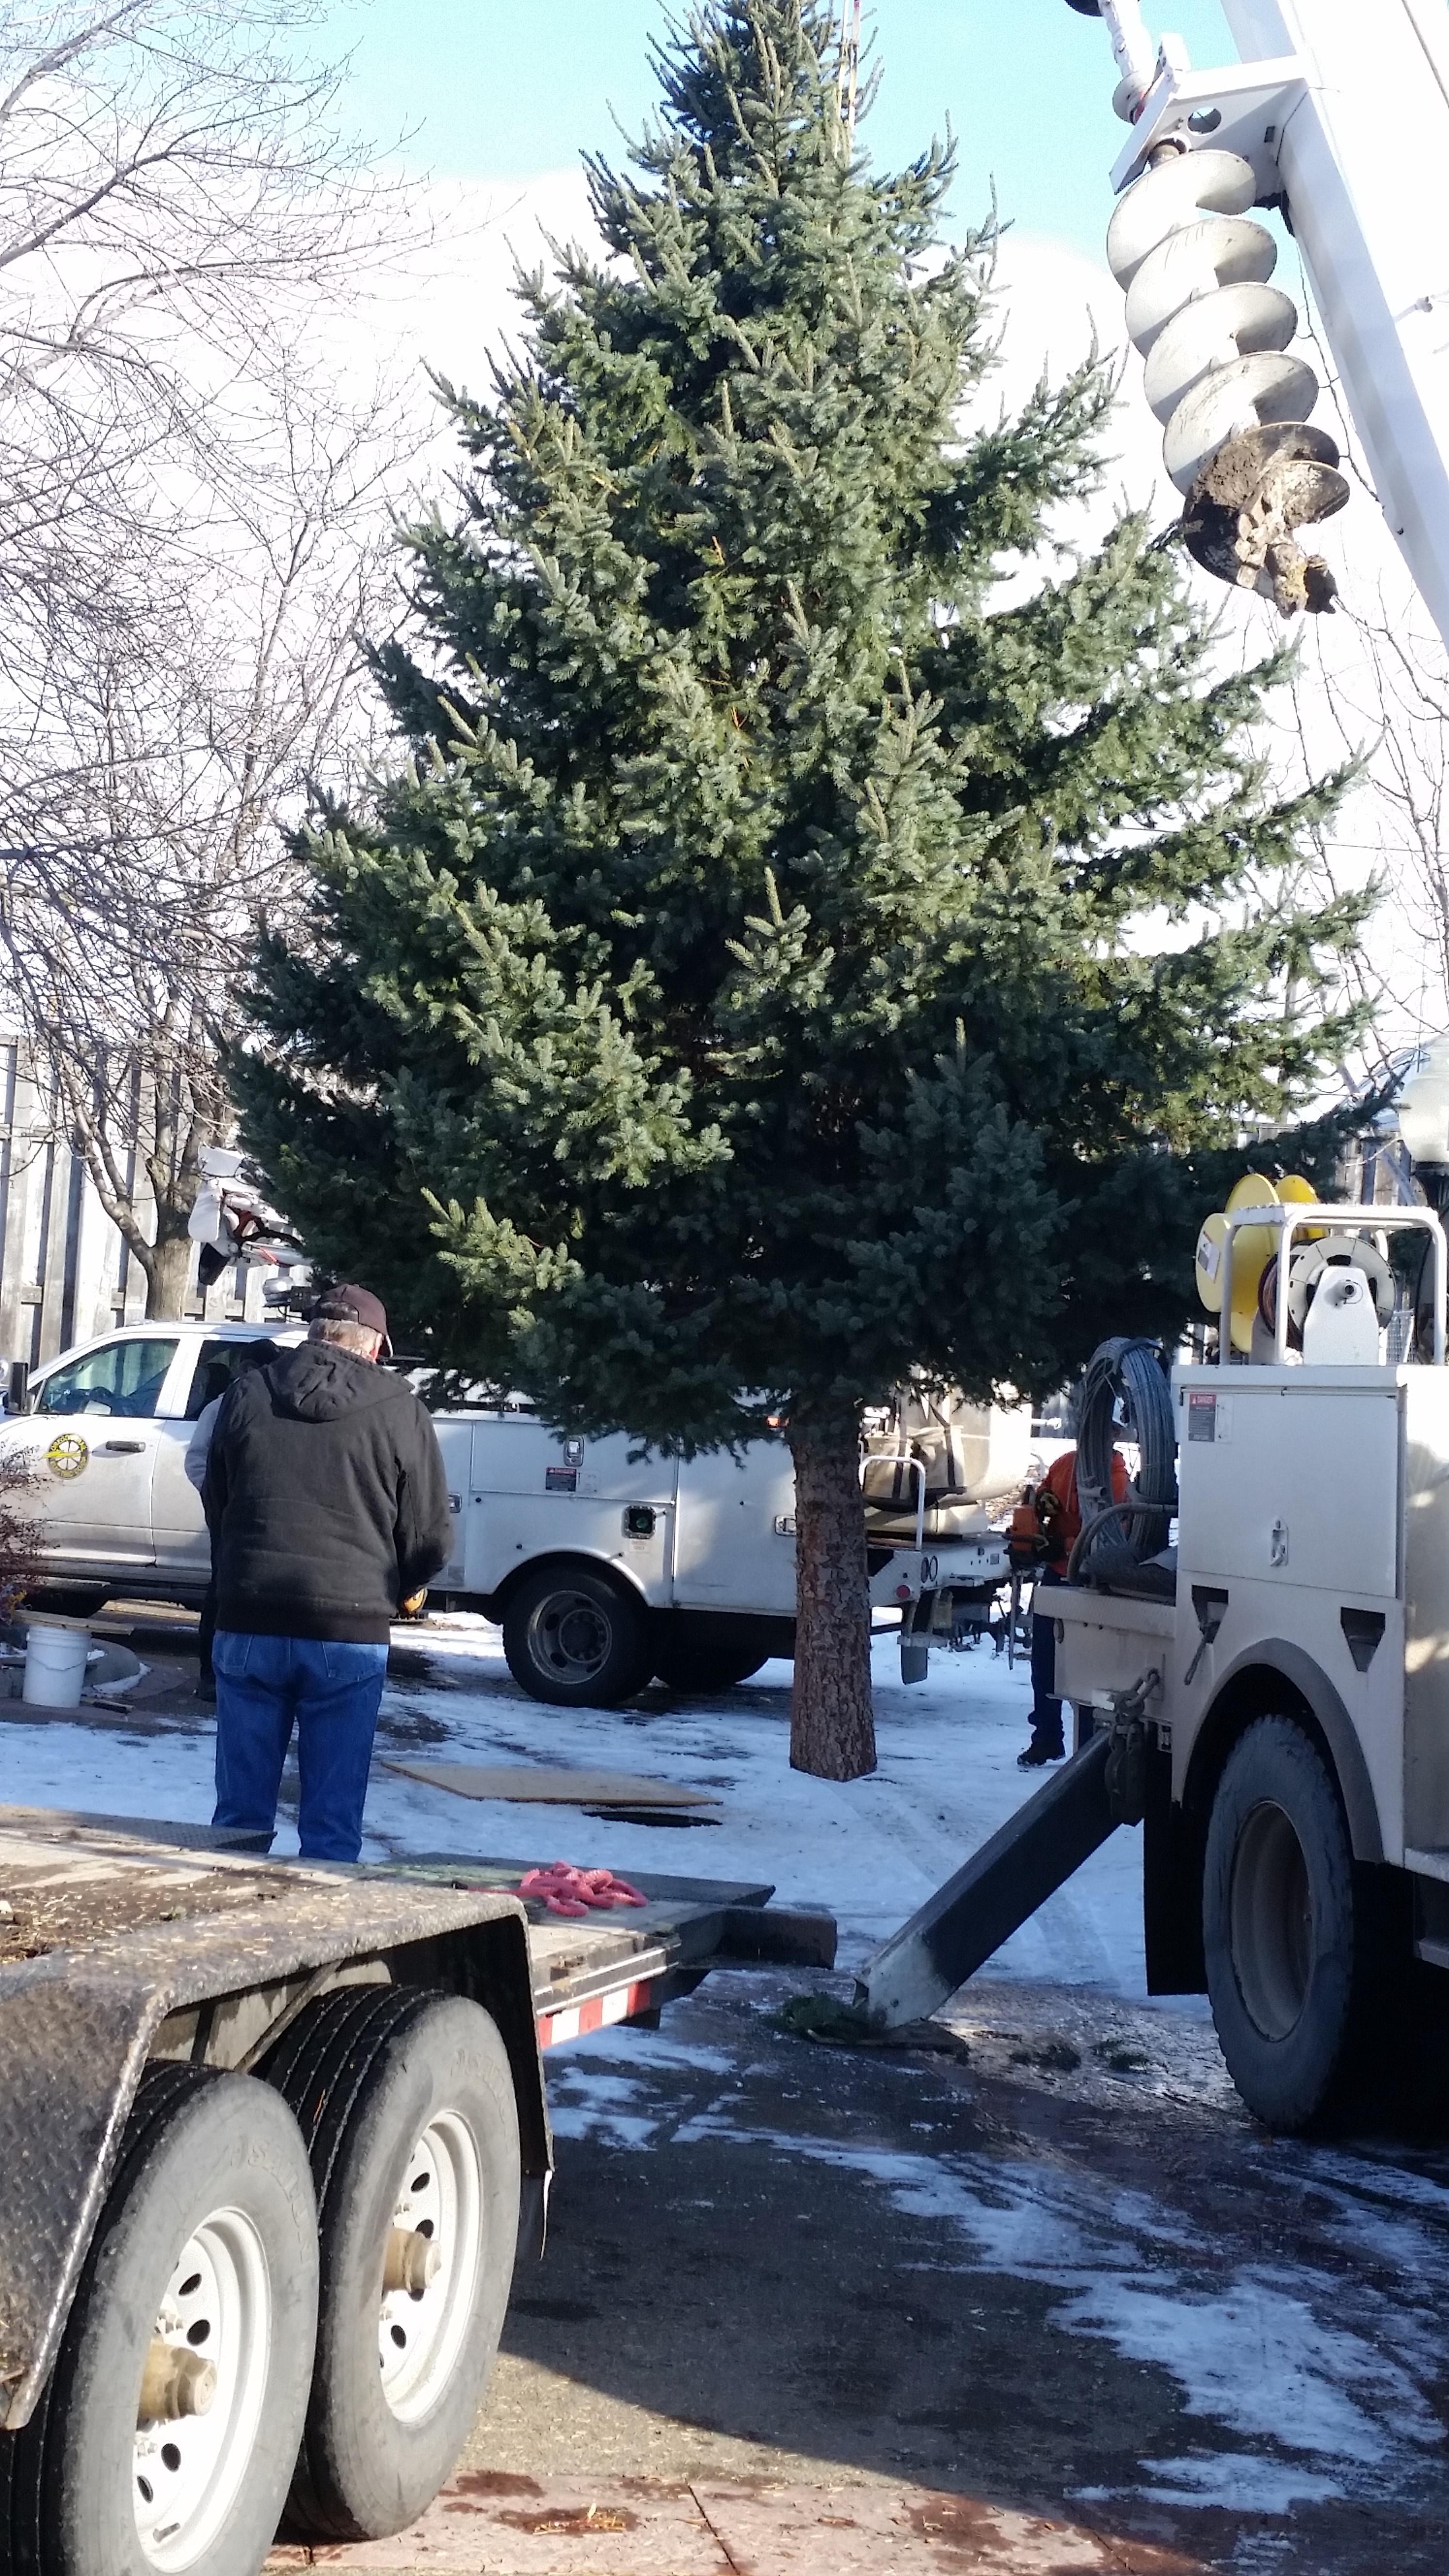 LA GRANDE:  Parade and Tree lighting